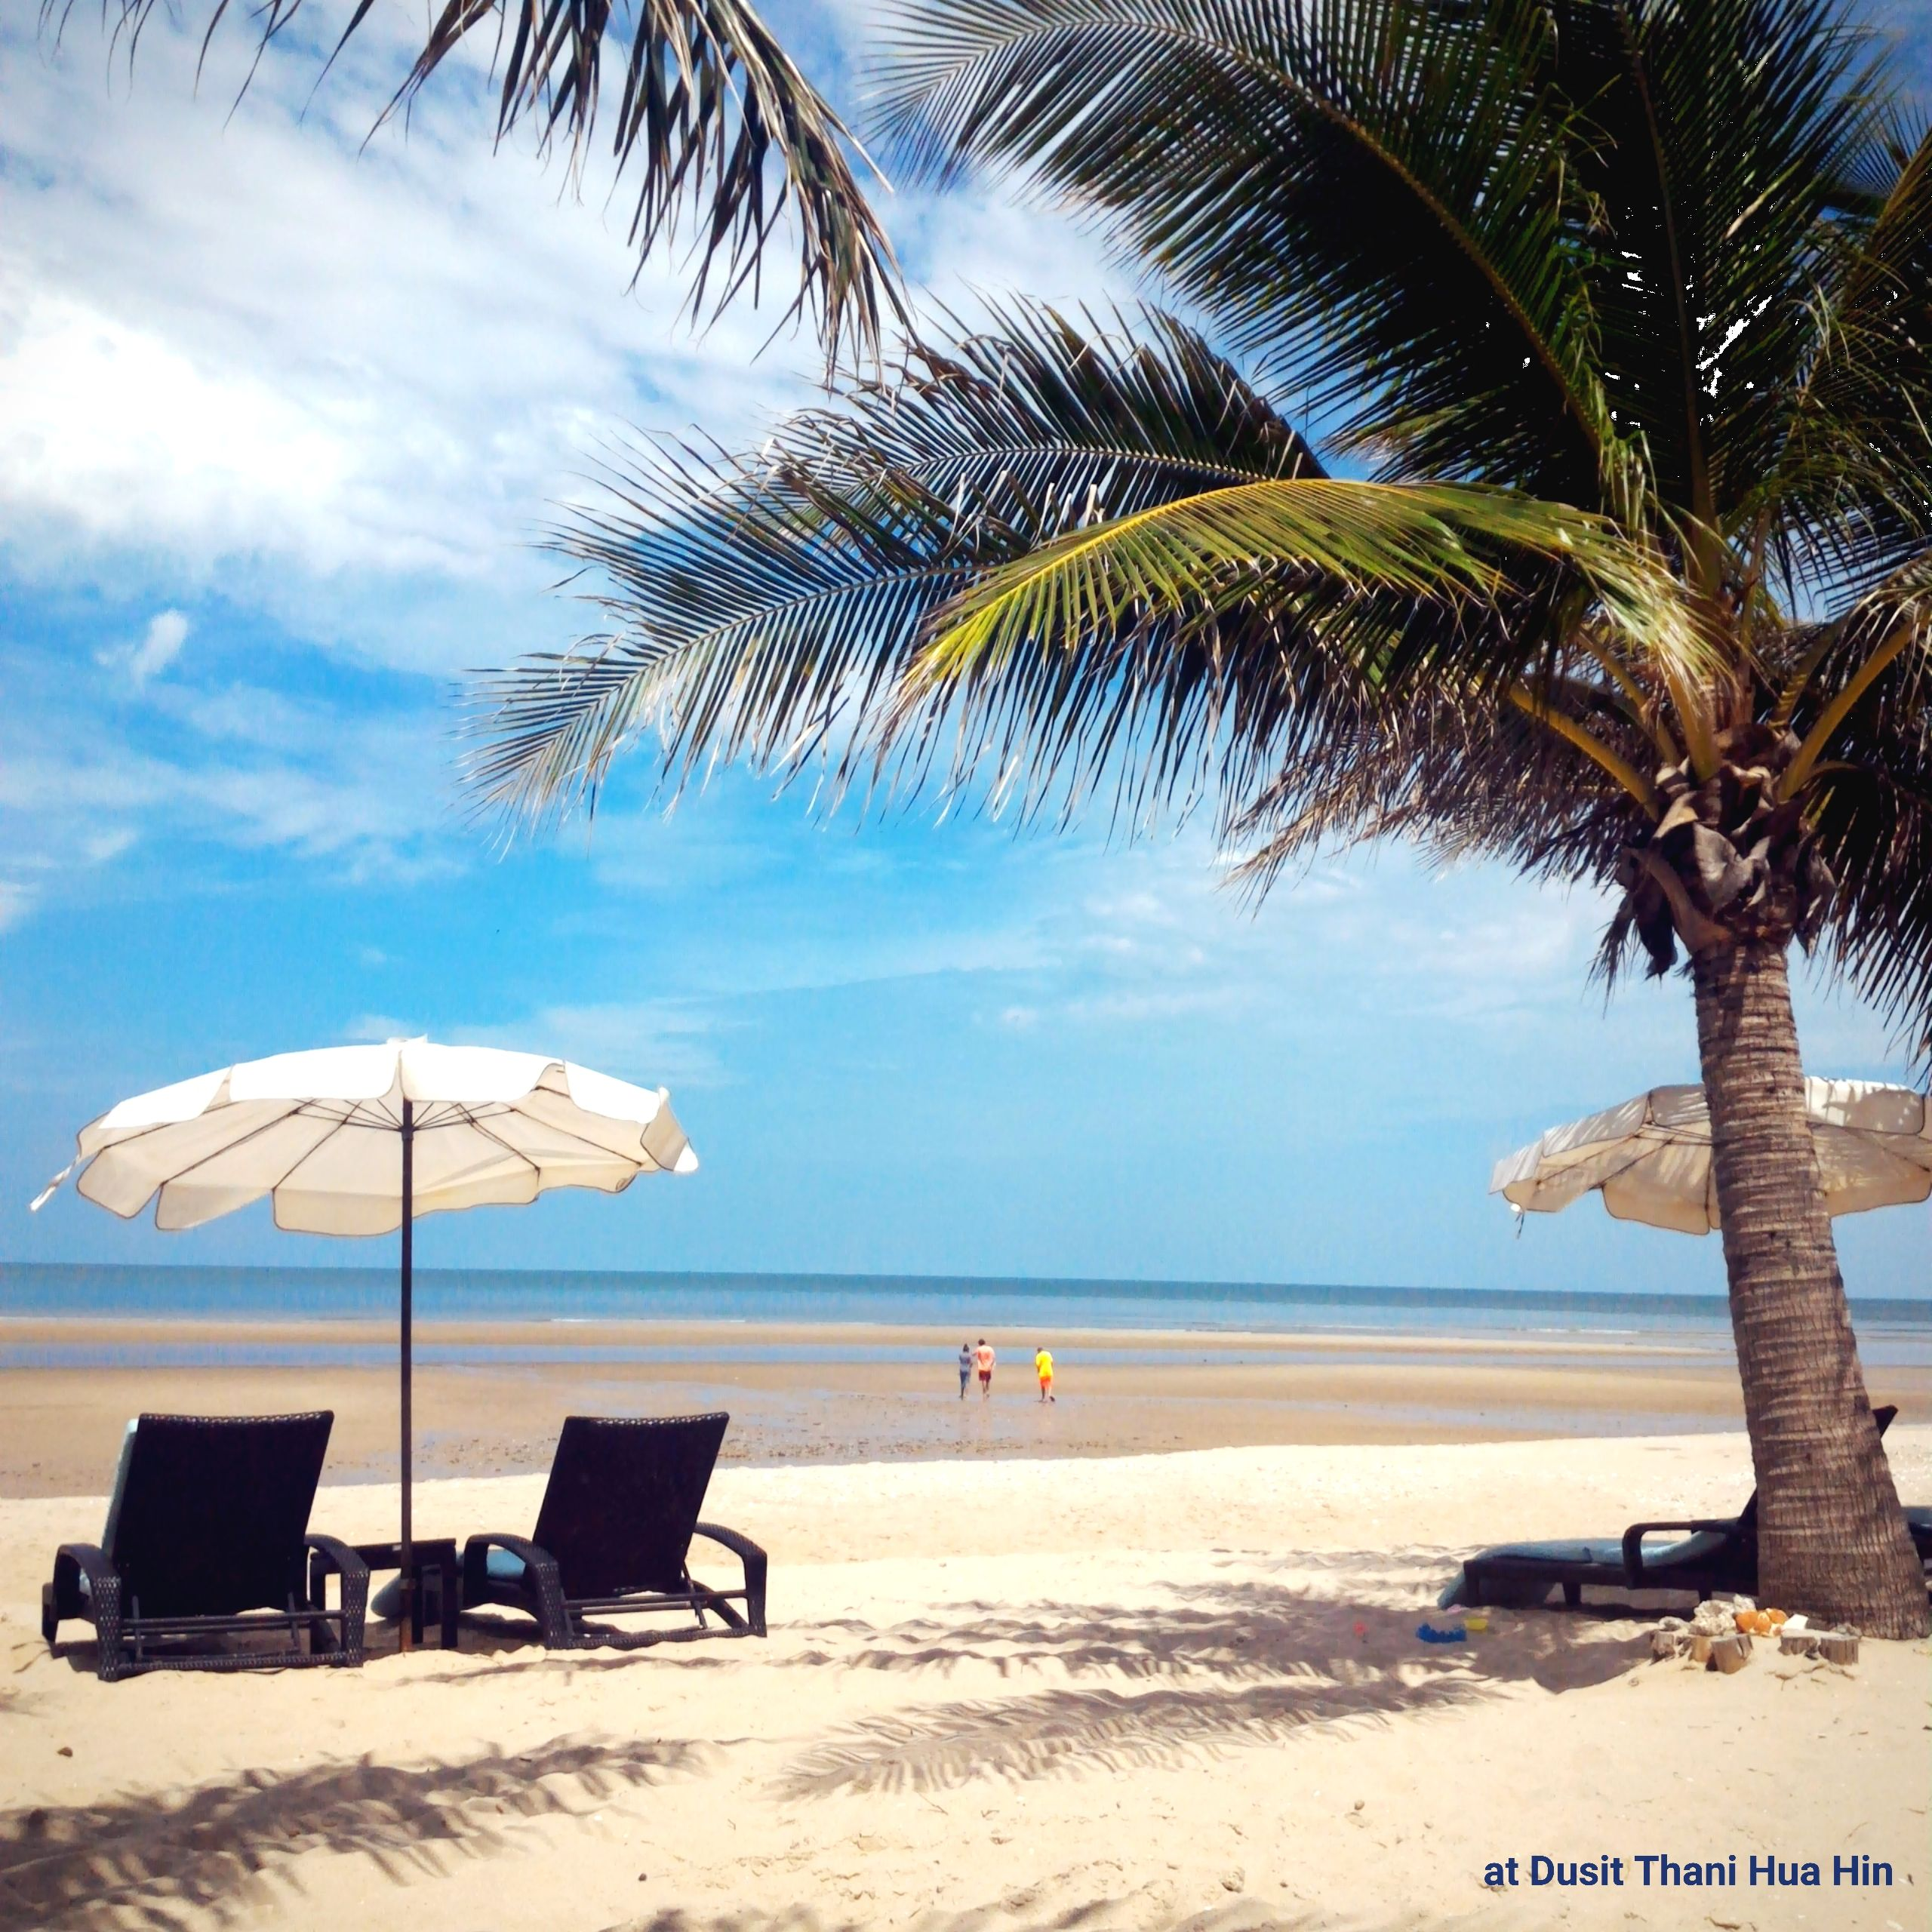 'Sunny day on the beachfront with clear blue sky', share your #staycation style with us. วันหยุดพักผ่อนกับบรรยากาศดีดีริมชายหาดกับท้องฟ้าสดใส :) #dusitjourneys #dusitmoments #dusitthani #huahin #chaam #dusitthanihuahin #snapandshare #clearbluesky #sunnyday www.dusit.com/dthh